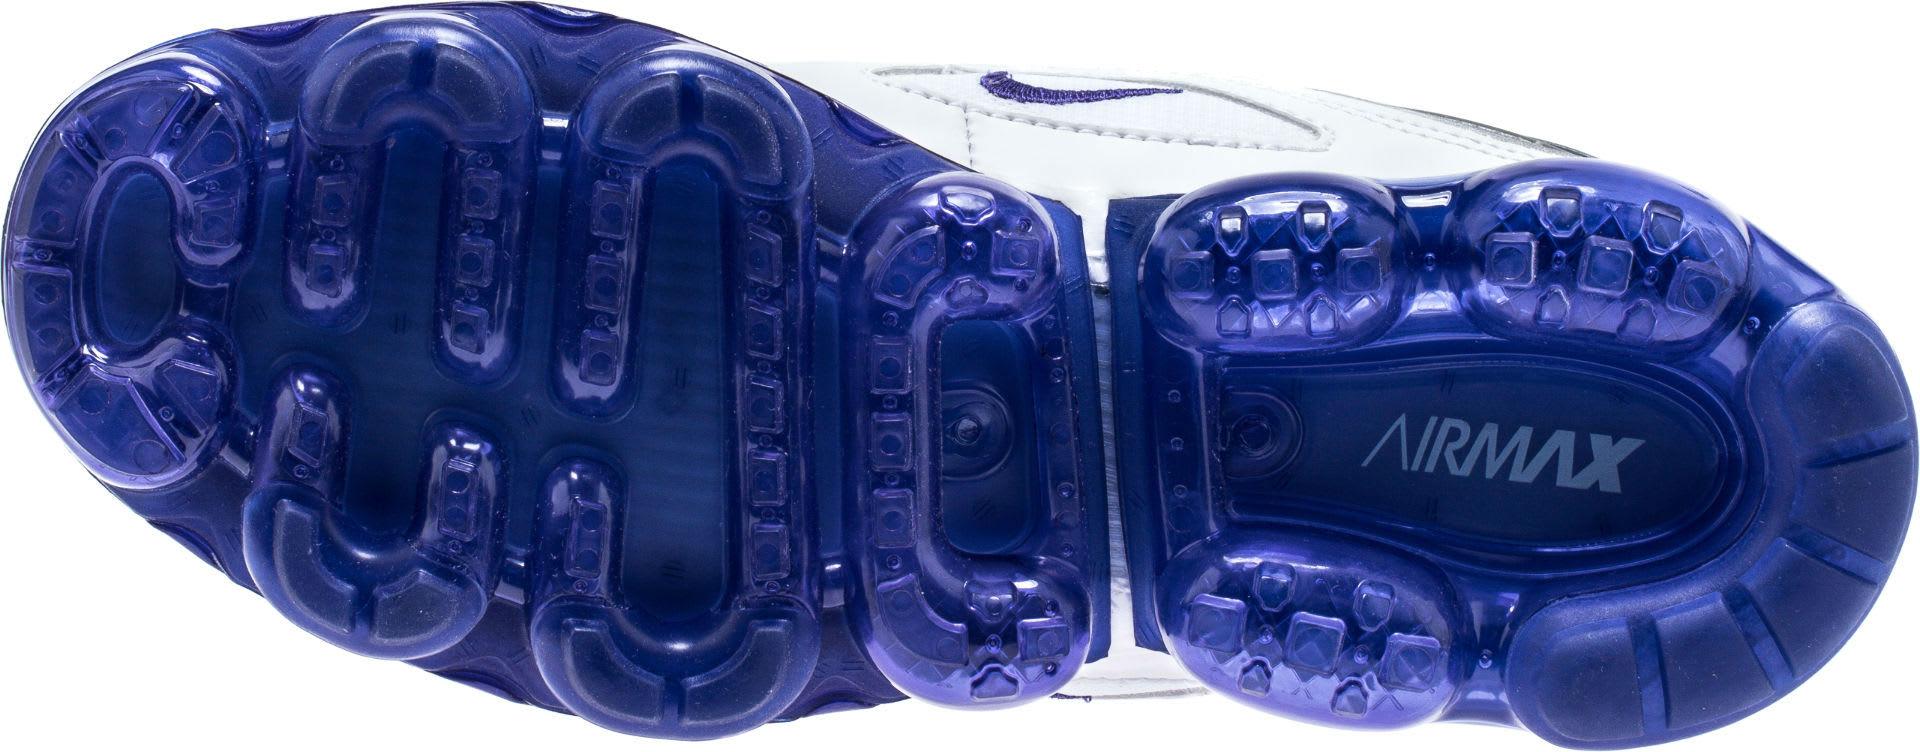 Nike Air VaporMax 97 Aqua Release Date AJ7291-100 Sole